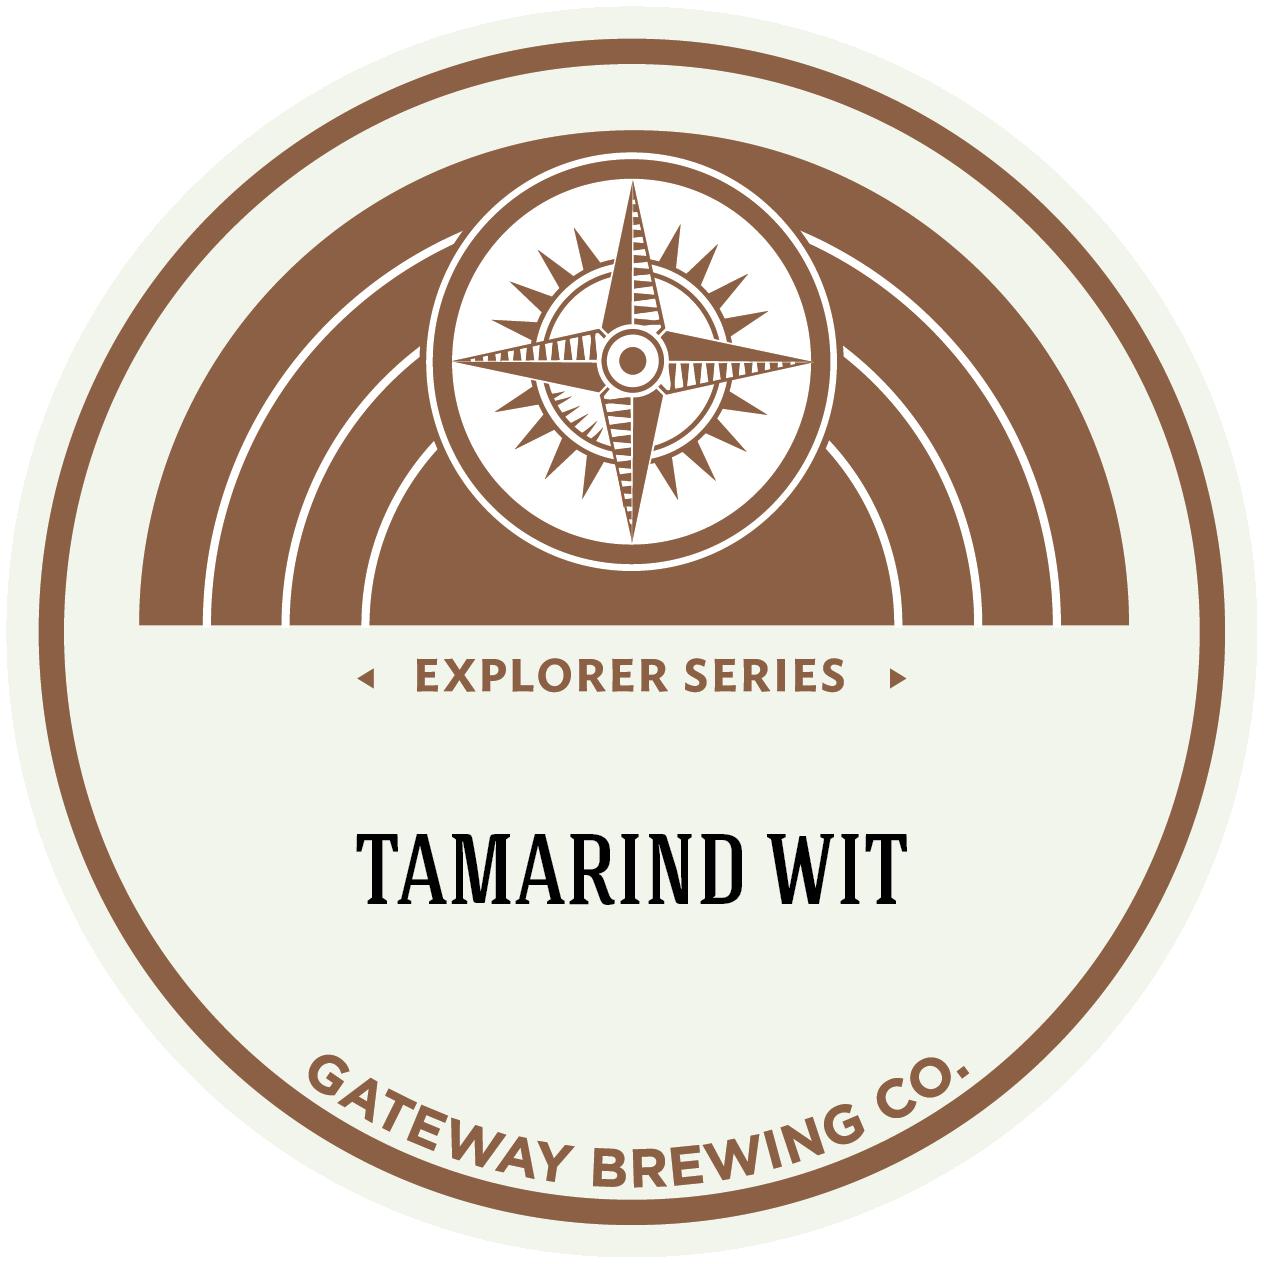 Tamarind Wit